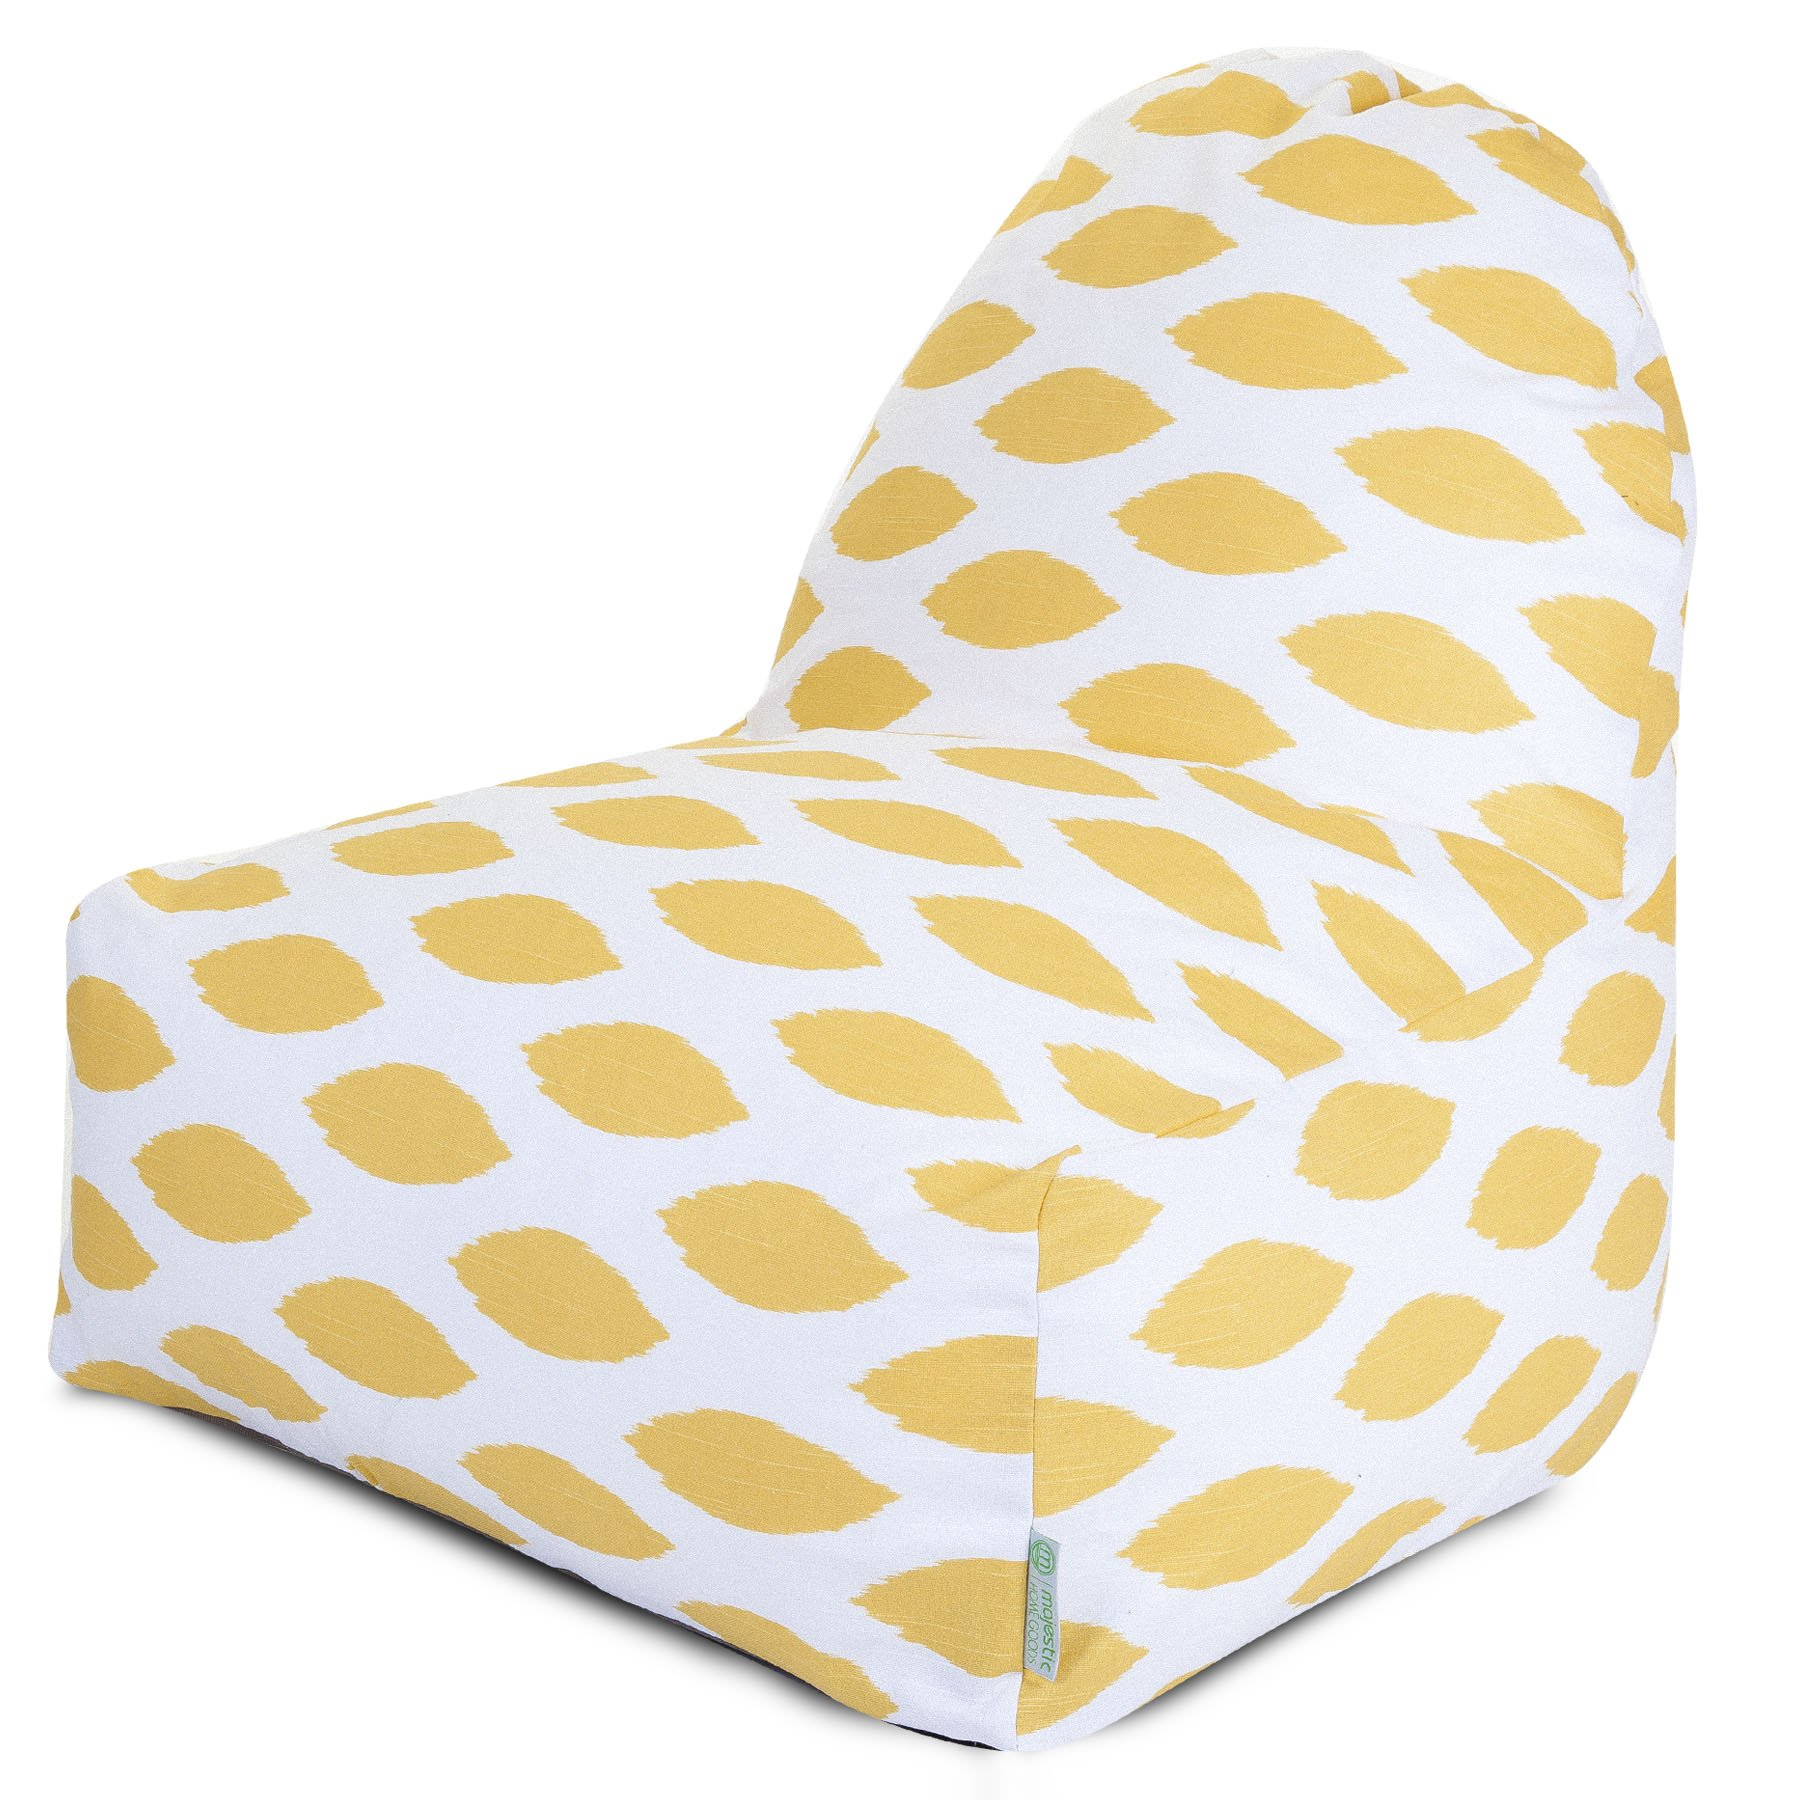 Majestic Home Goods Yellow Alli Kick-It Chair